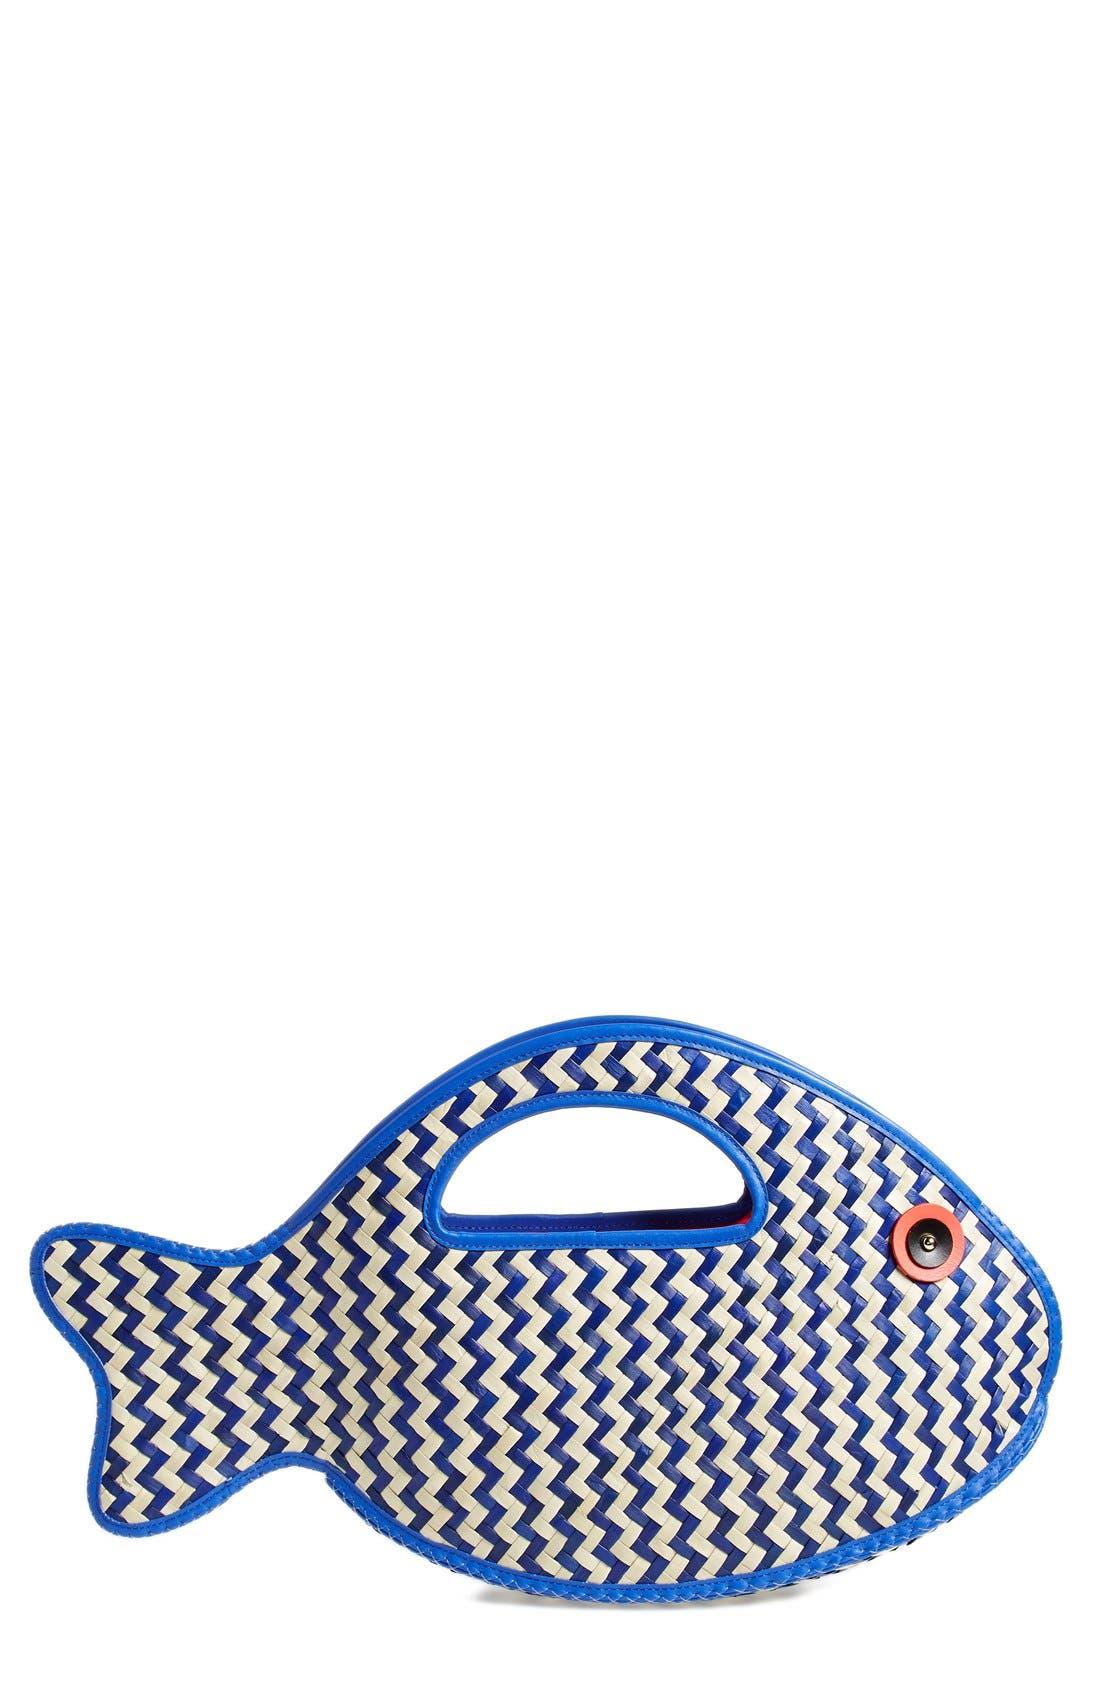 Main Image - kate spade new york 'splash out - fish' straw tote